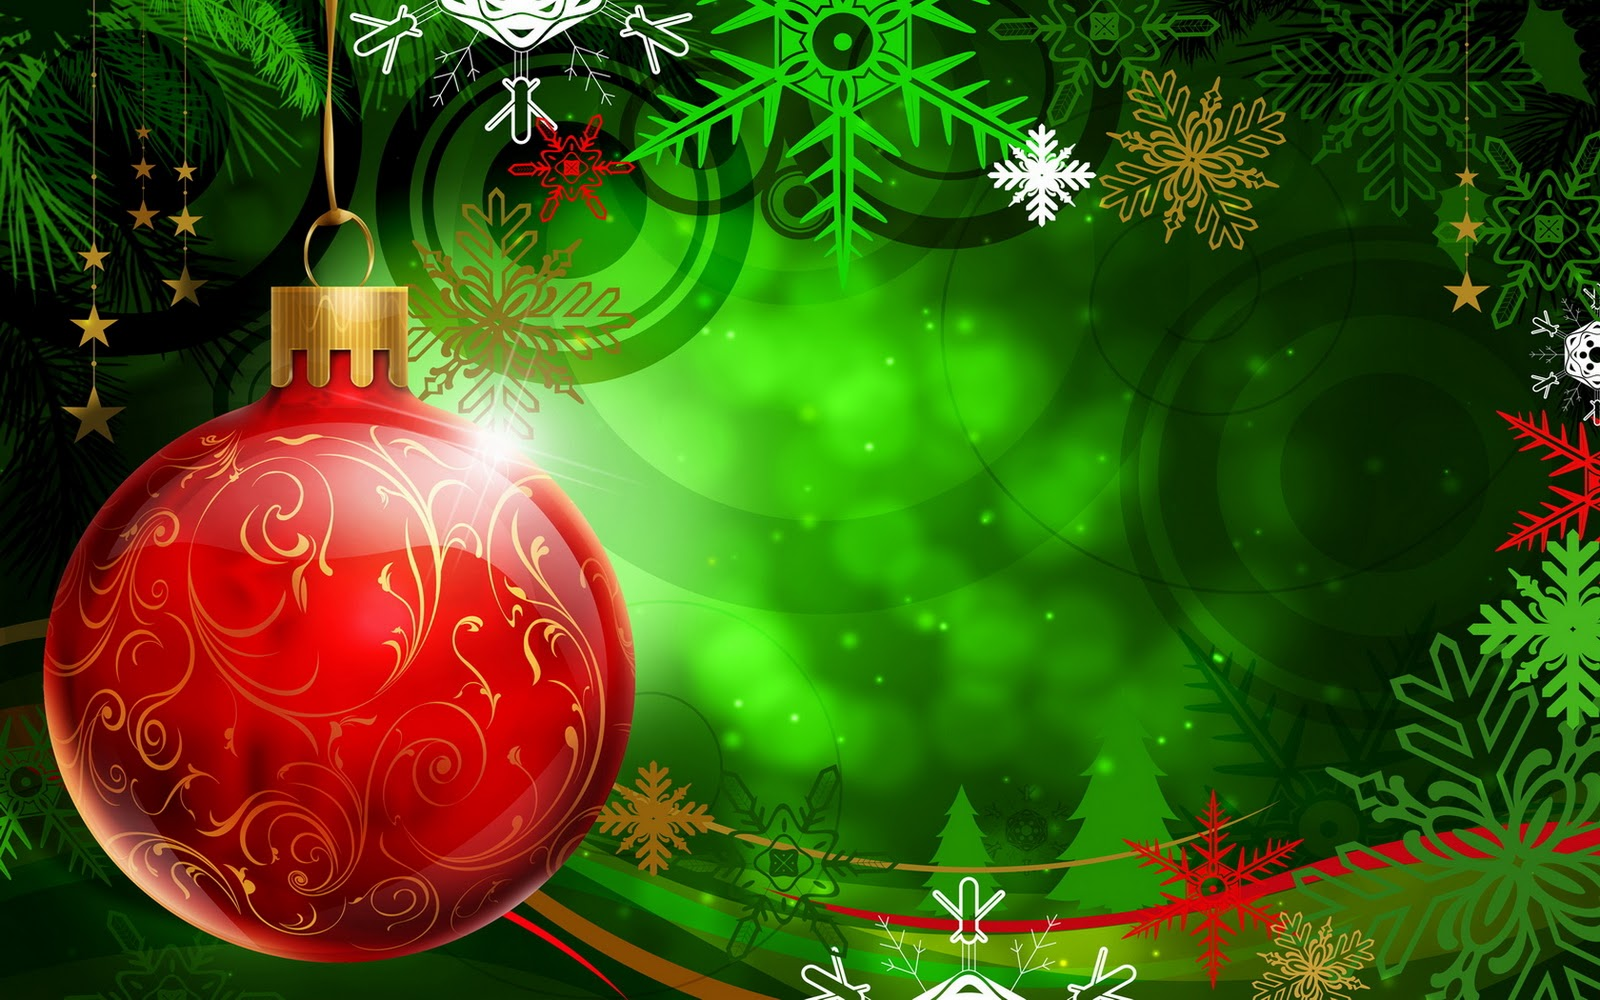 http://4.bp.blogspot.com/_YRRu3a9Ipck/TOKjcUydmbI/AAAAAAAAADw/qa8ZMYt3mDM/s1600/christmas-wallpaper.jpg